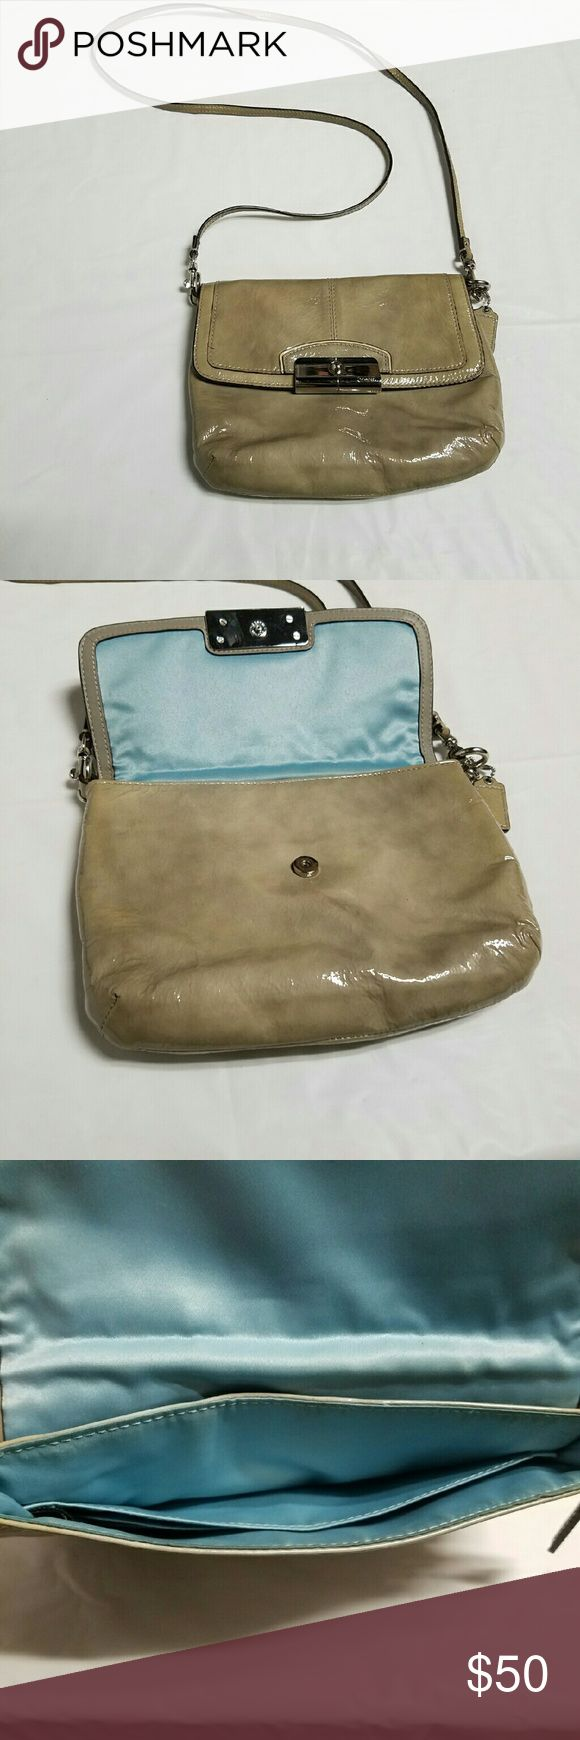 Coach Swingpack Glossy green coach bag, sky blue interior, detachable strap Coach Bags Crossbody Bags